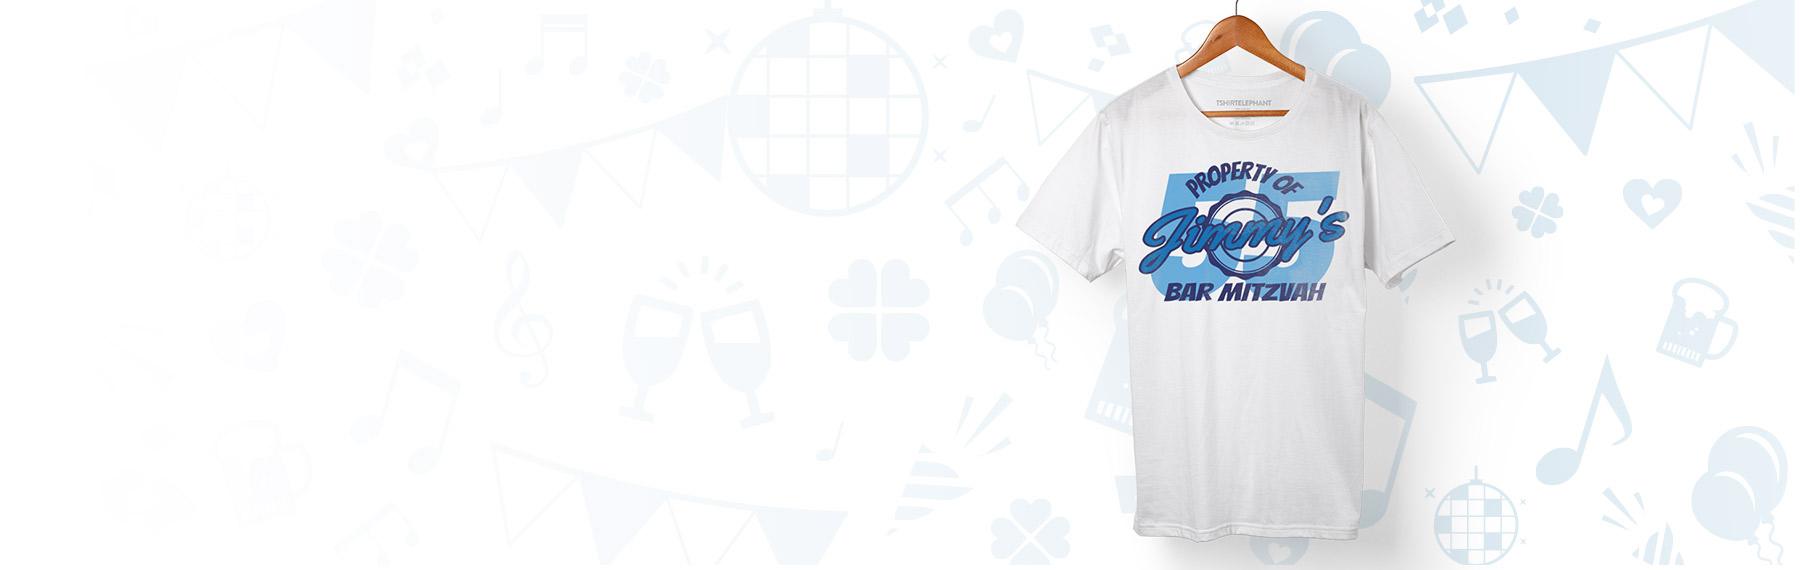 Custom bar mitzvah t shirts design online for Custom bar t shirts